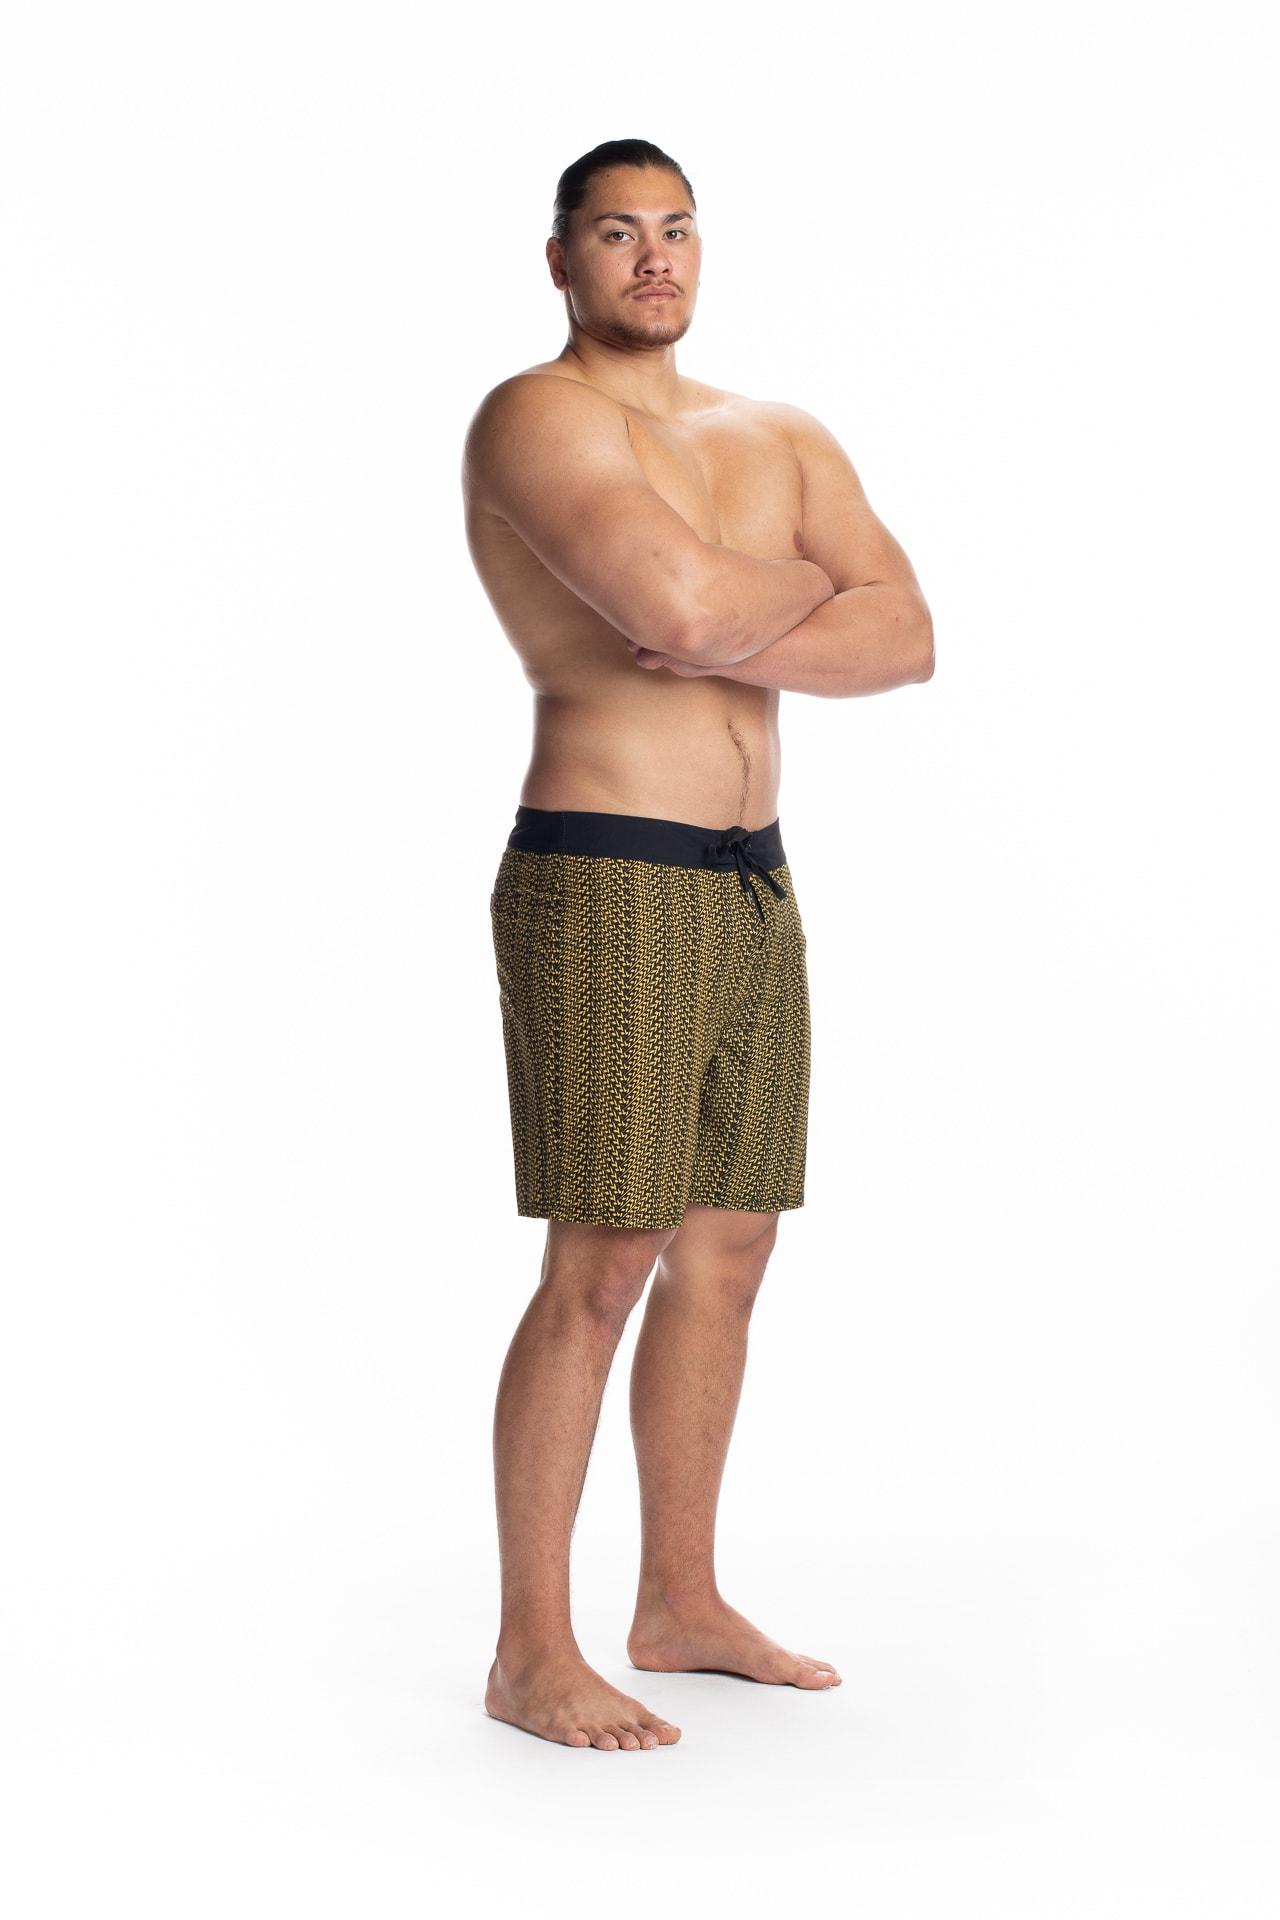 Male model wearing 4-way Stretch in Black Yellow Niau - Side View